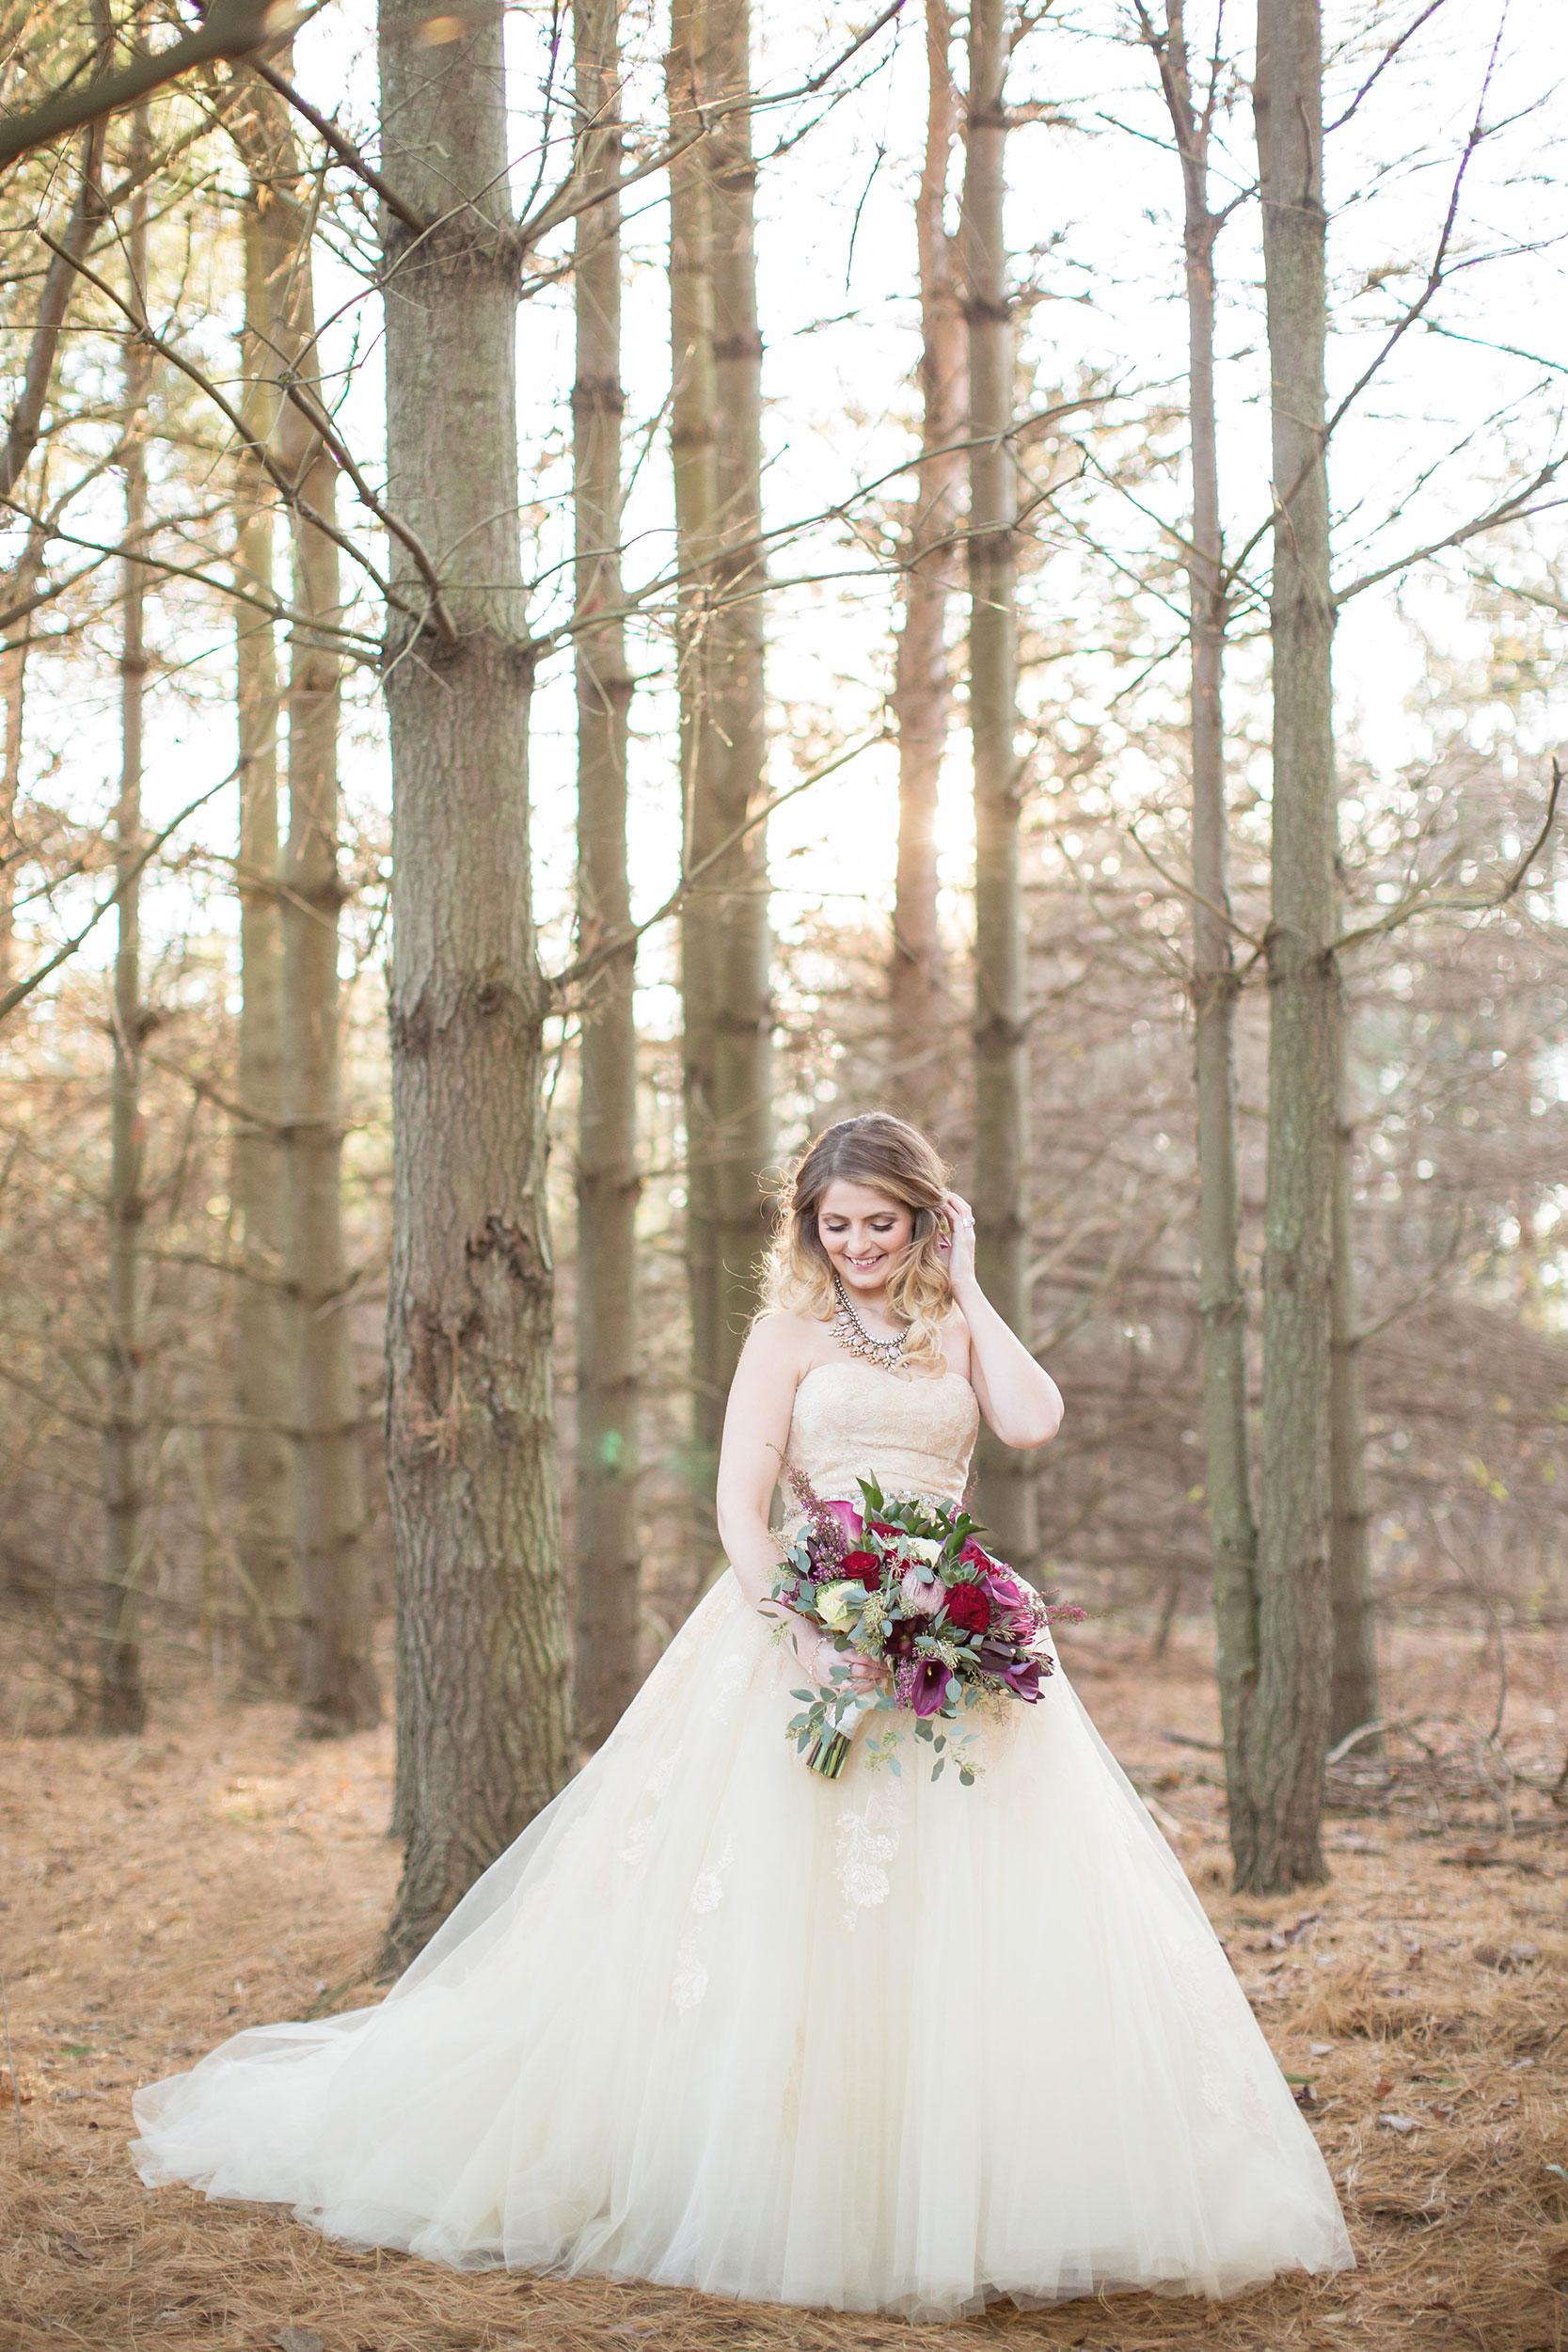 windsor-ontario-wedding-photographer-botanical-wedding-toronto-weddingbells-magazine-eryn-shea-photography-04.jpg